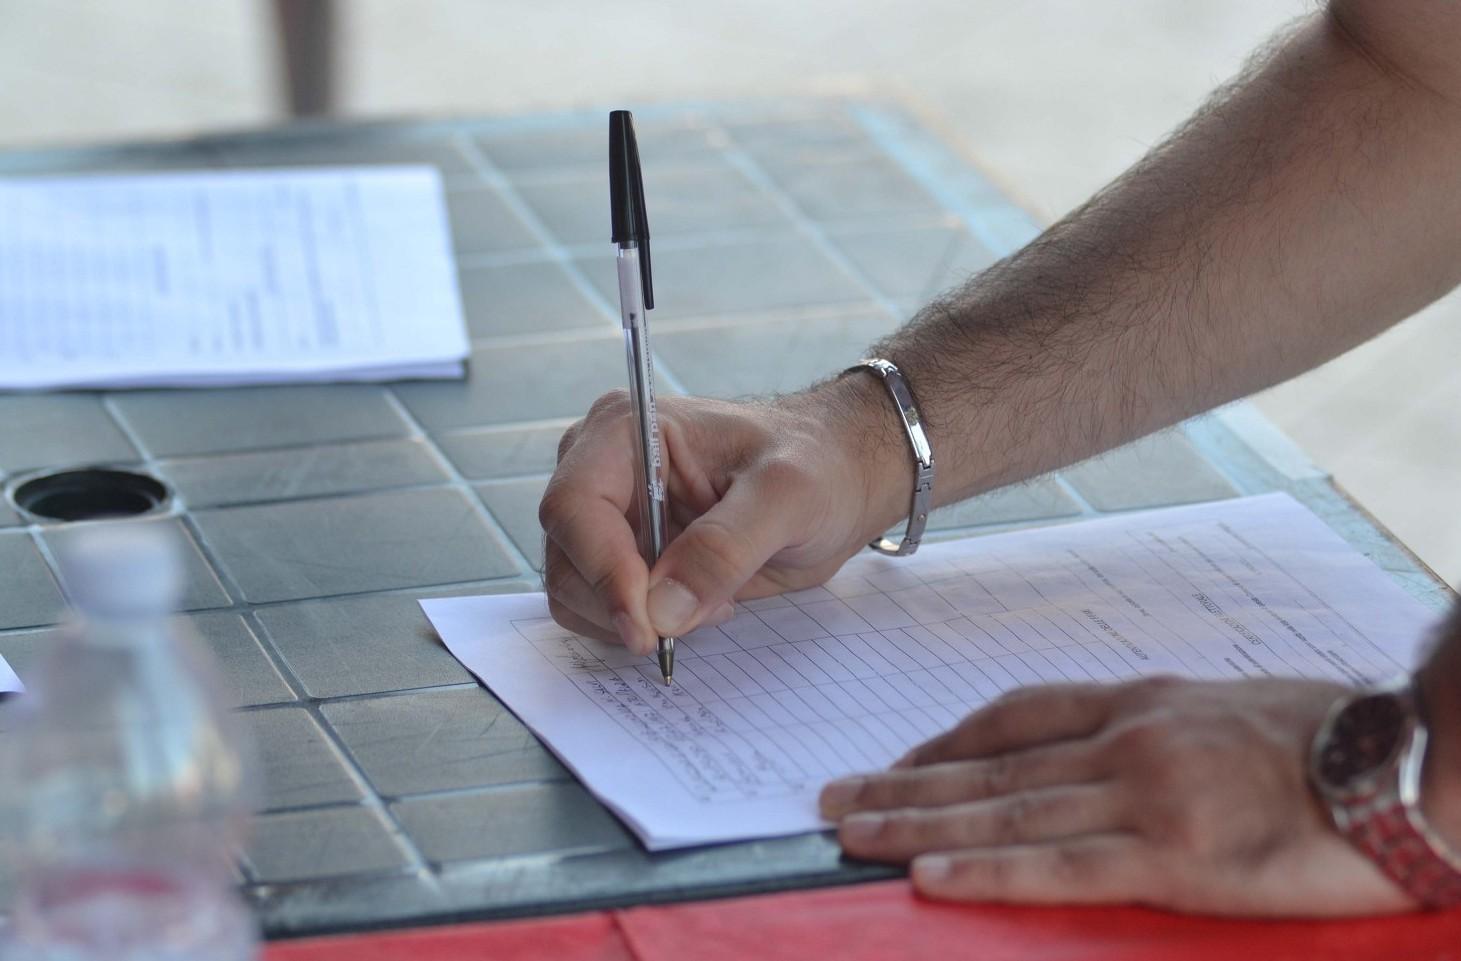 Pensioni ultime notizie, raccolta firma